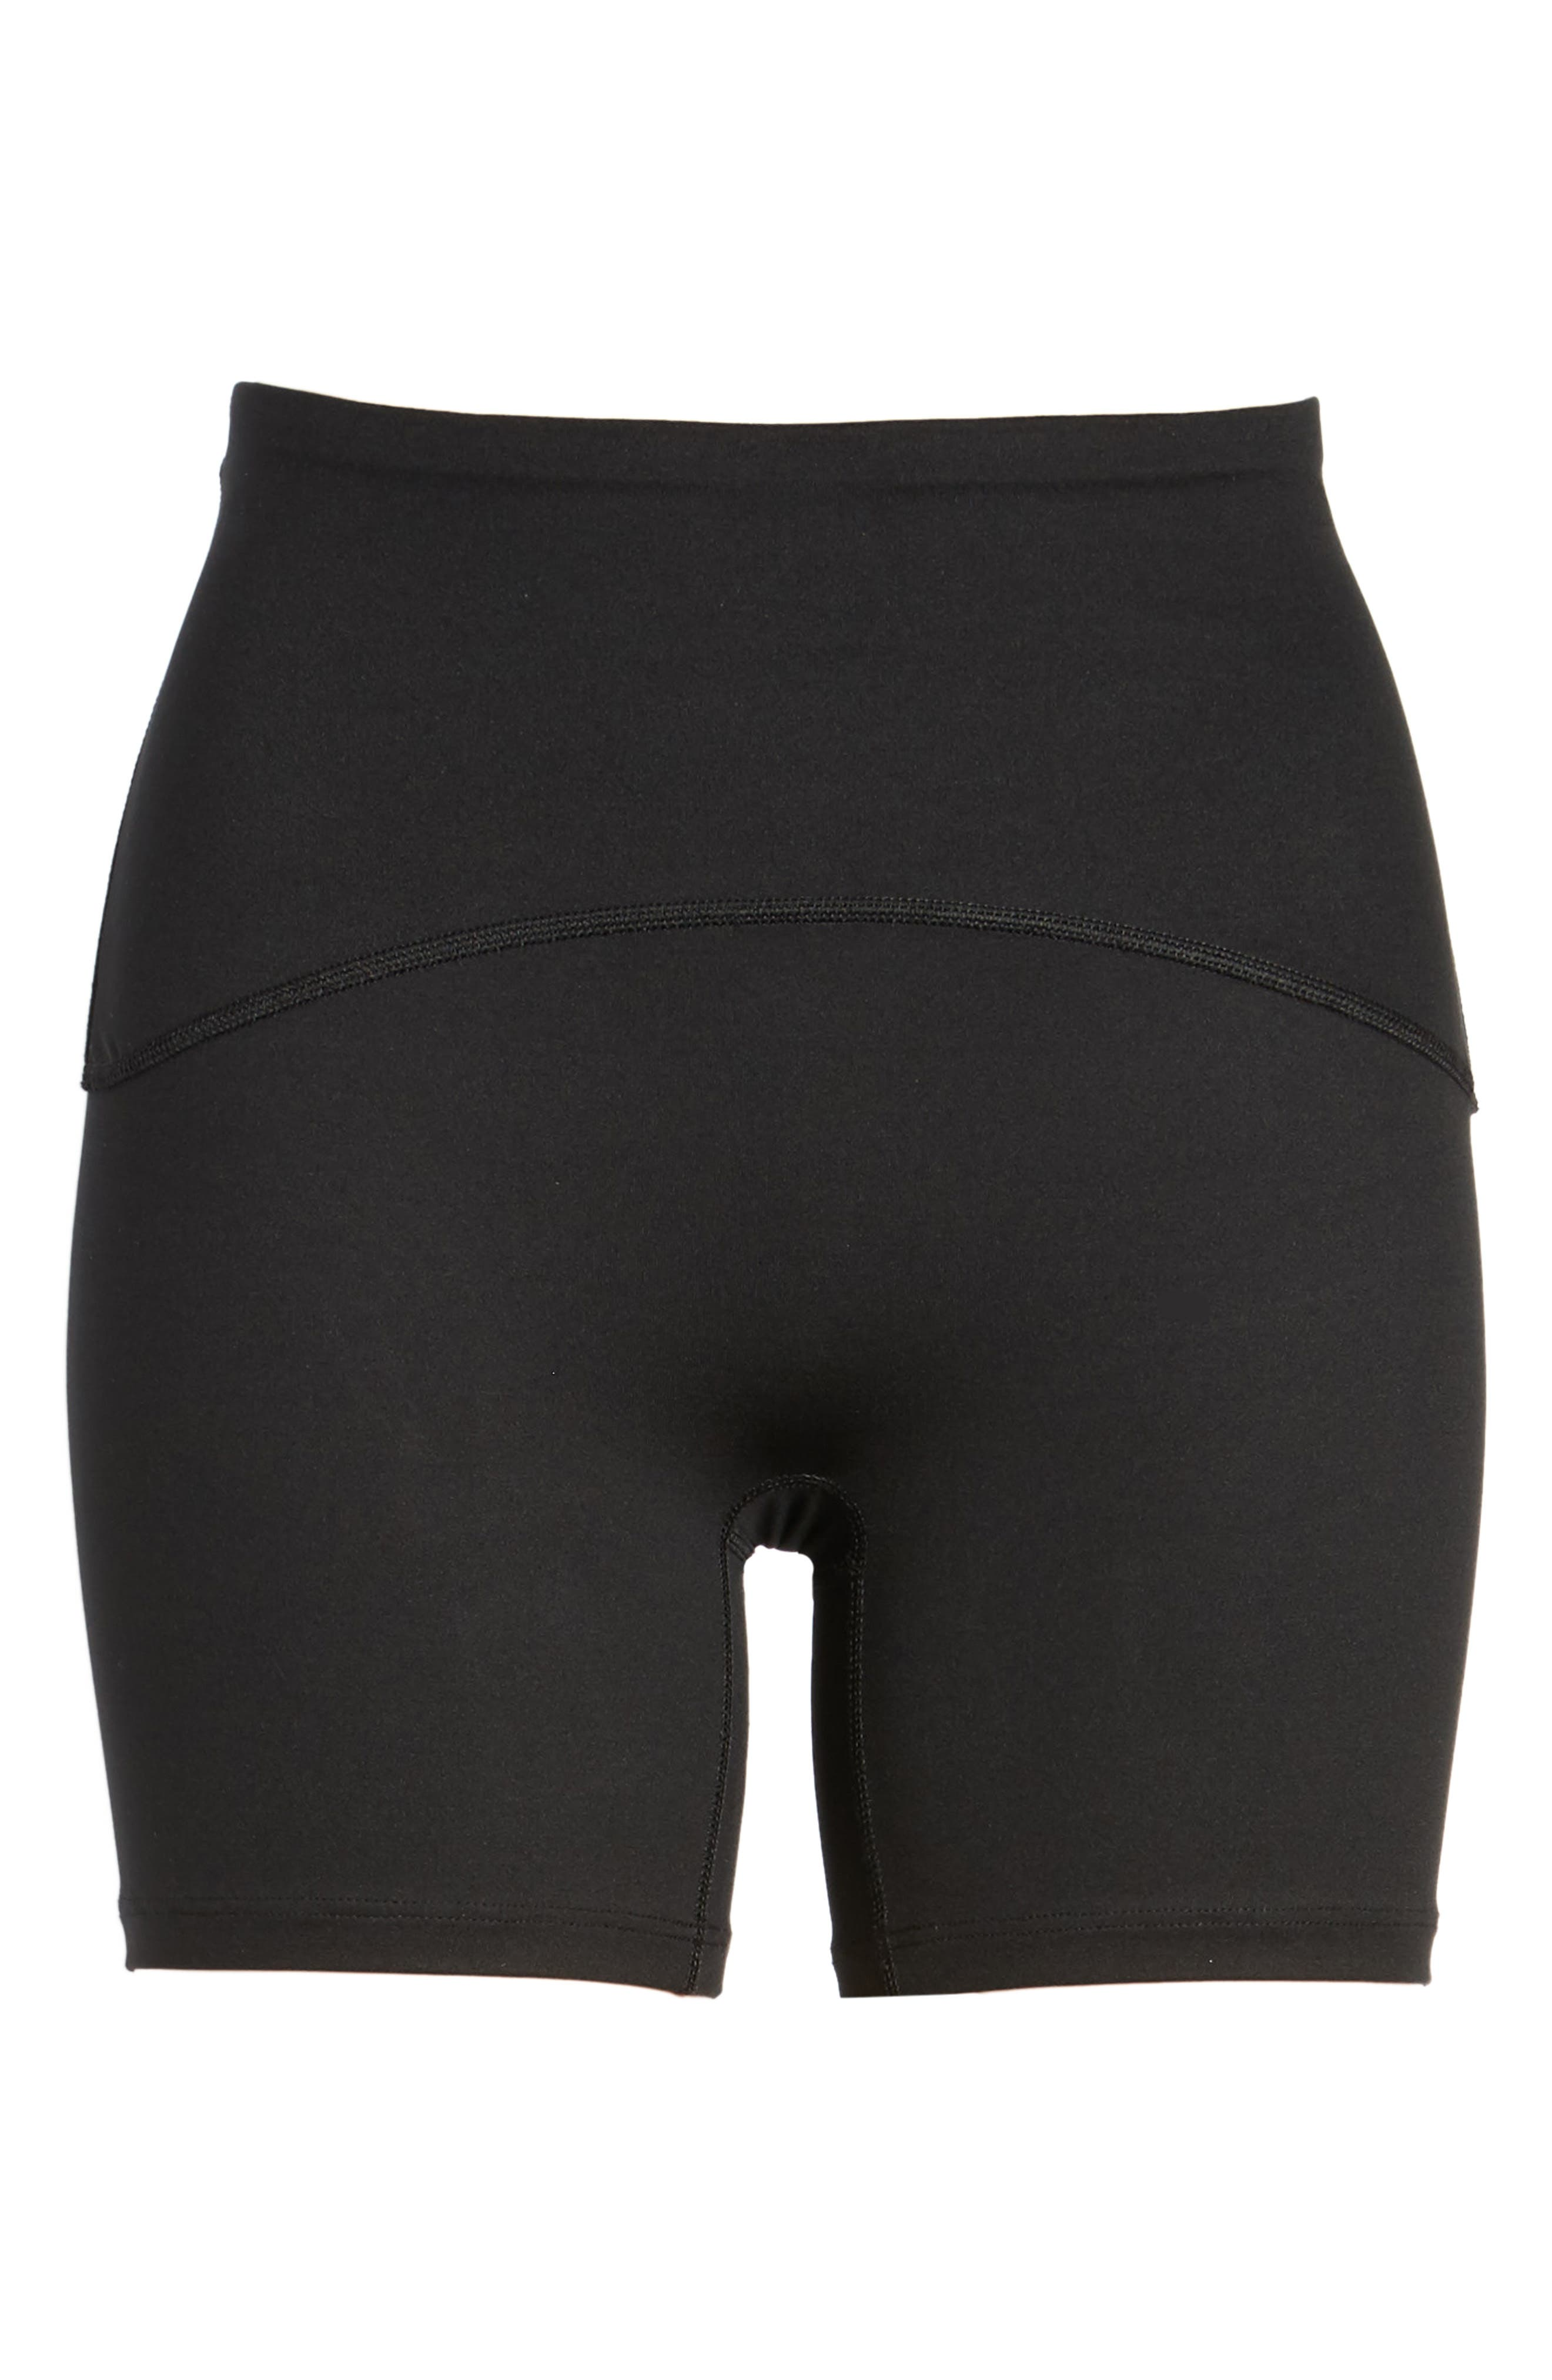 Sport Compression Shorts,                             Alternate thumbnail 6, color,                             Black